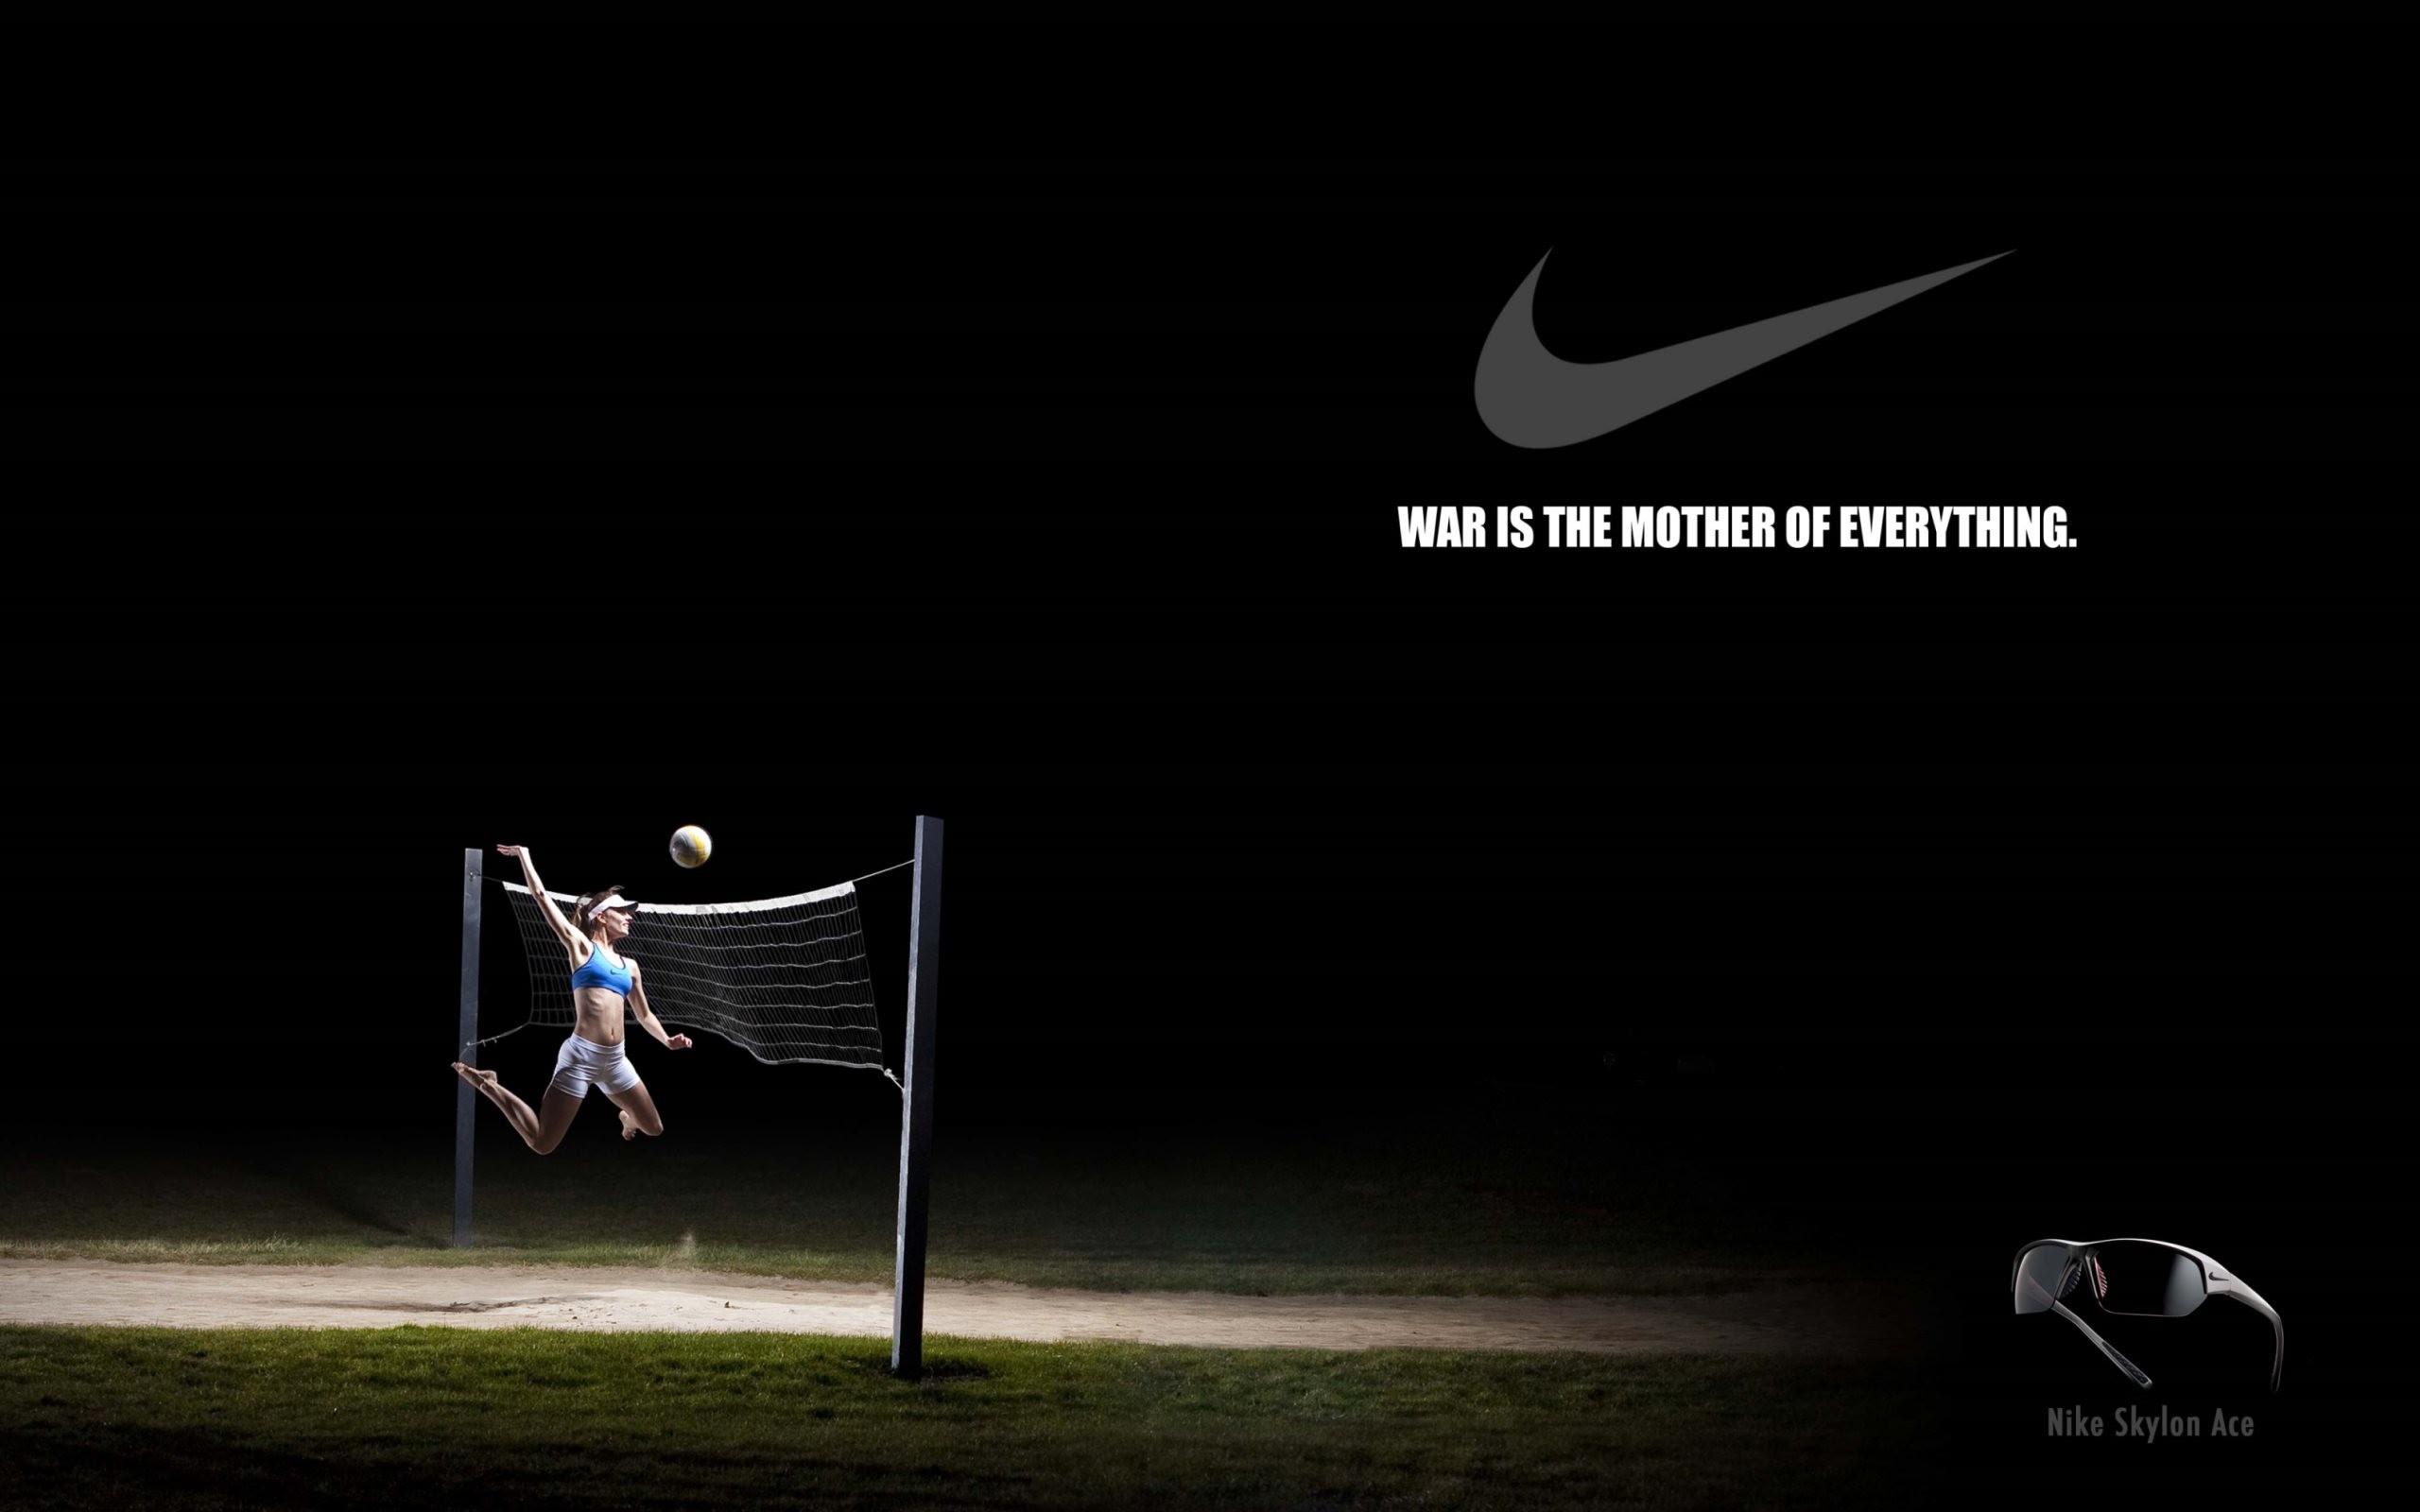 Nike Desktop Wallpaper (74+ images)